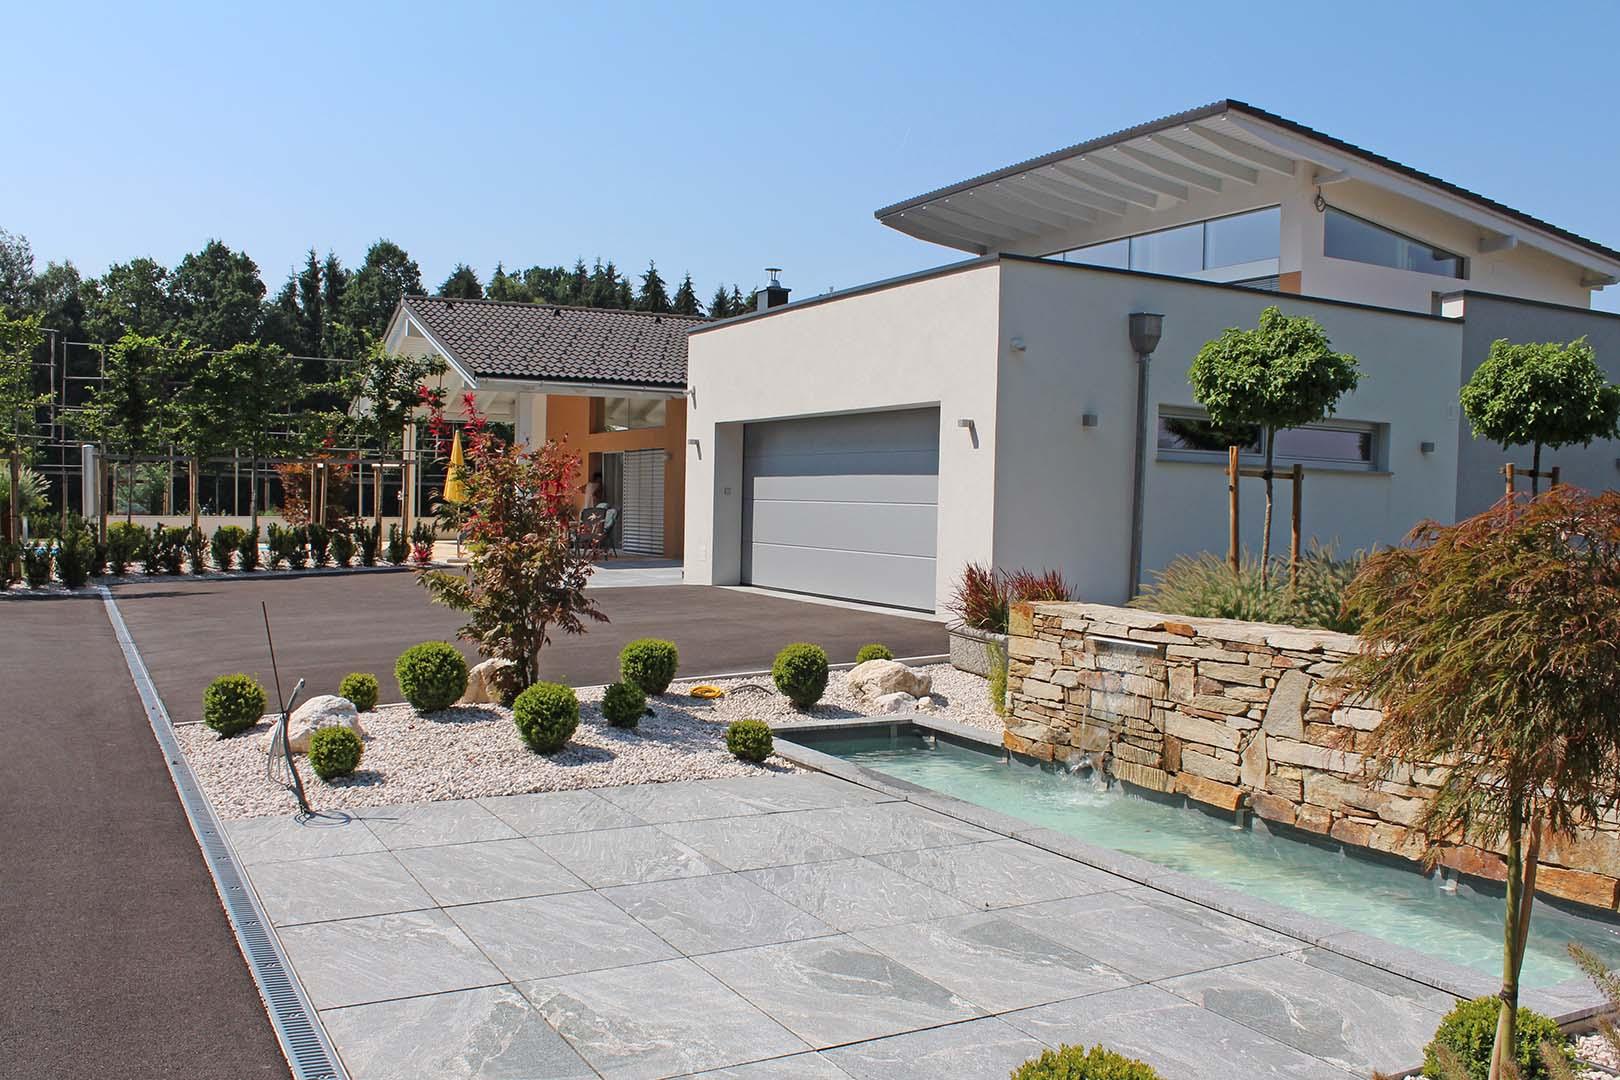 Gartenplanung Mauerbau